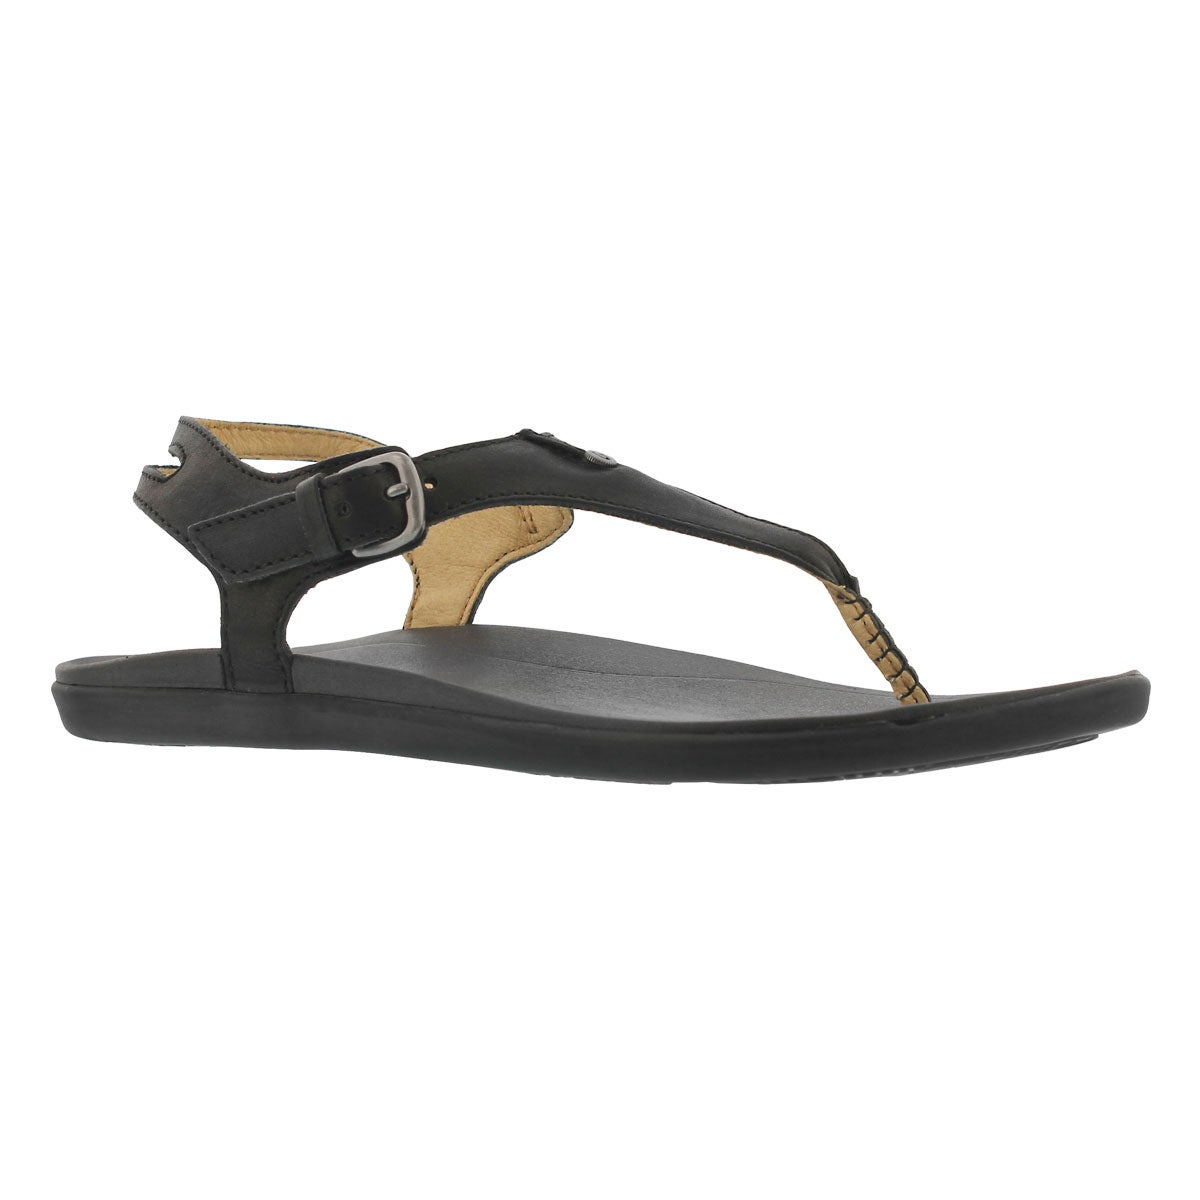 Women's EHEU black/black thong sandals